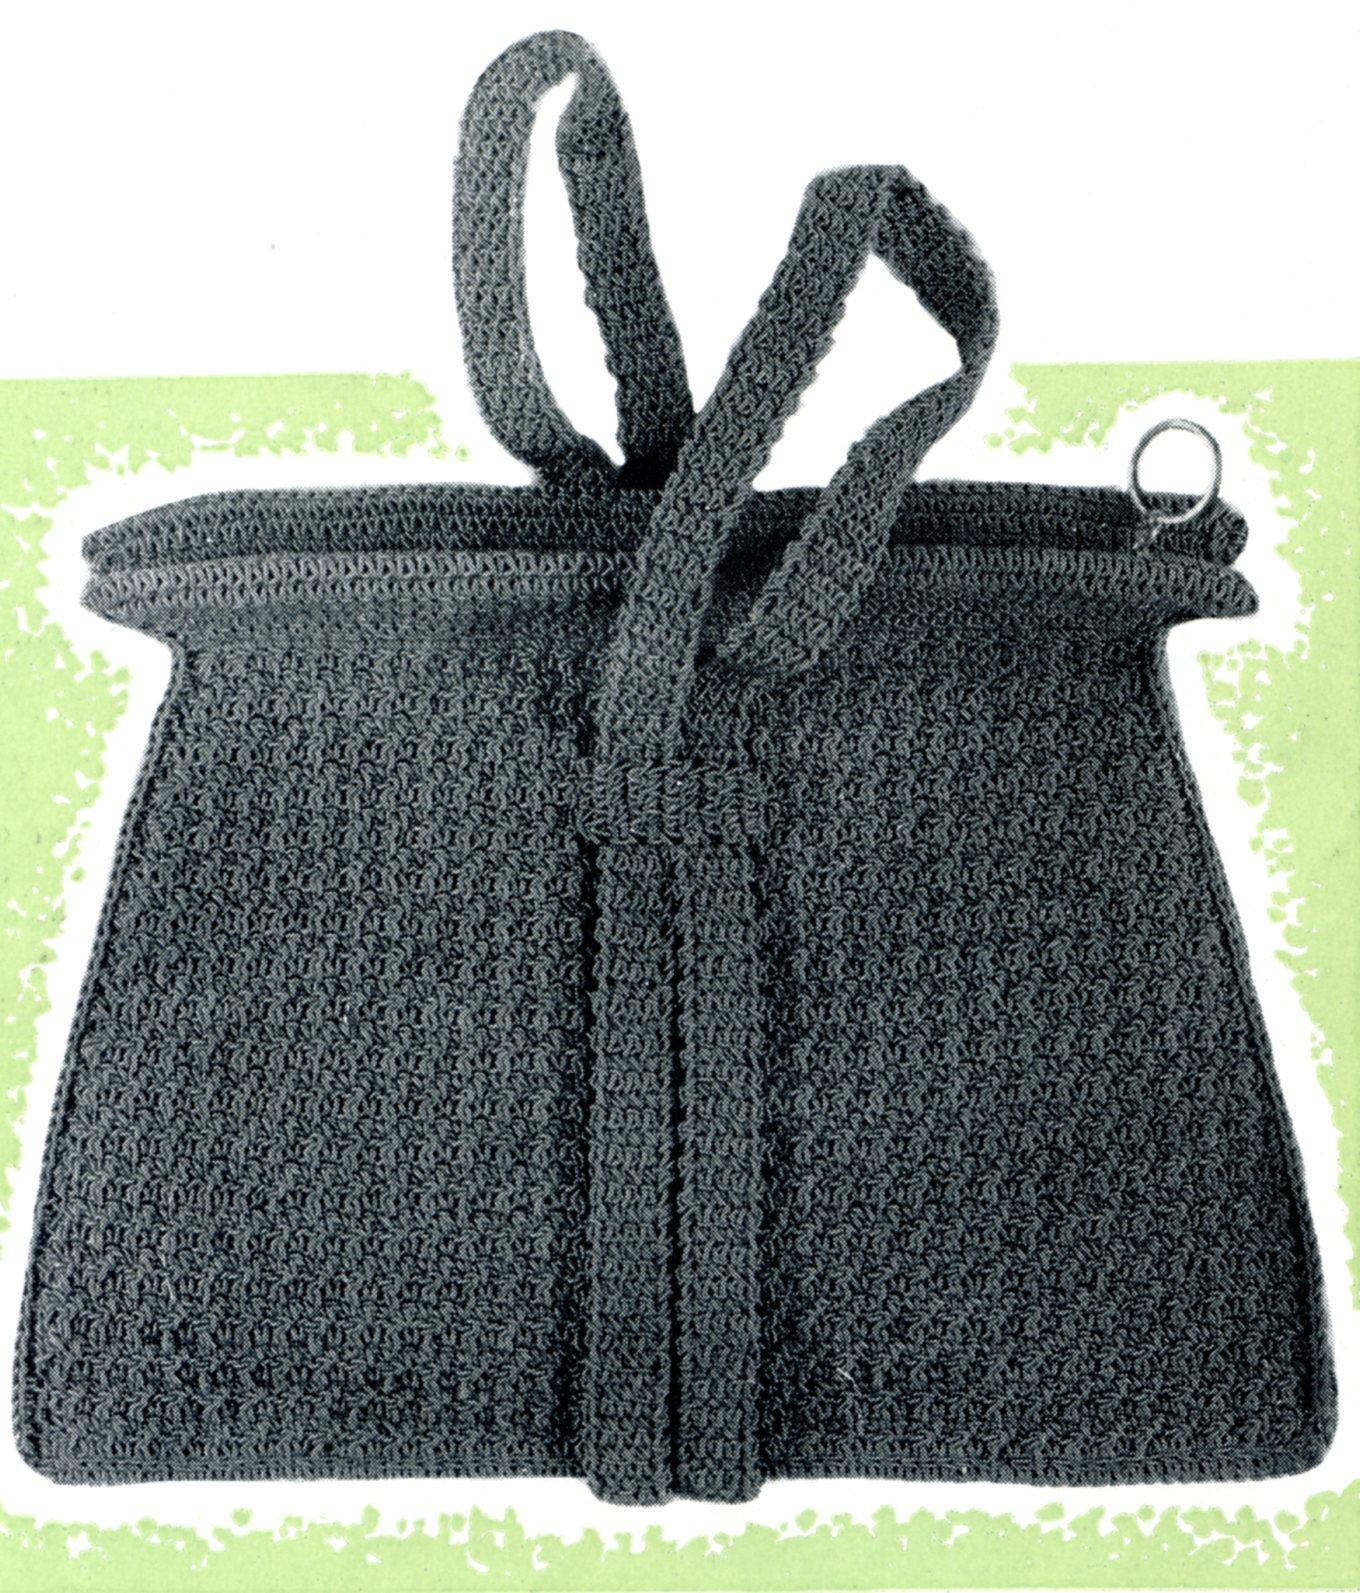 Donna S Crochet Designs Blog Of Free Patterns 2013 01 27